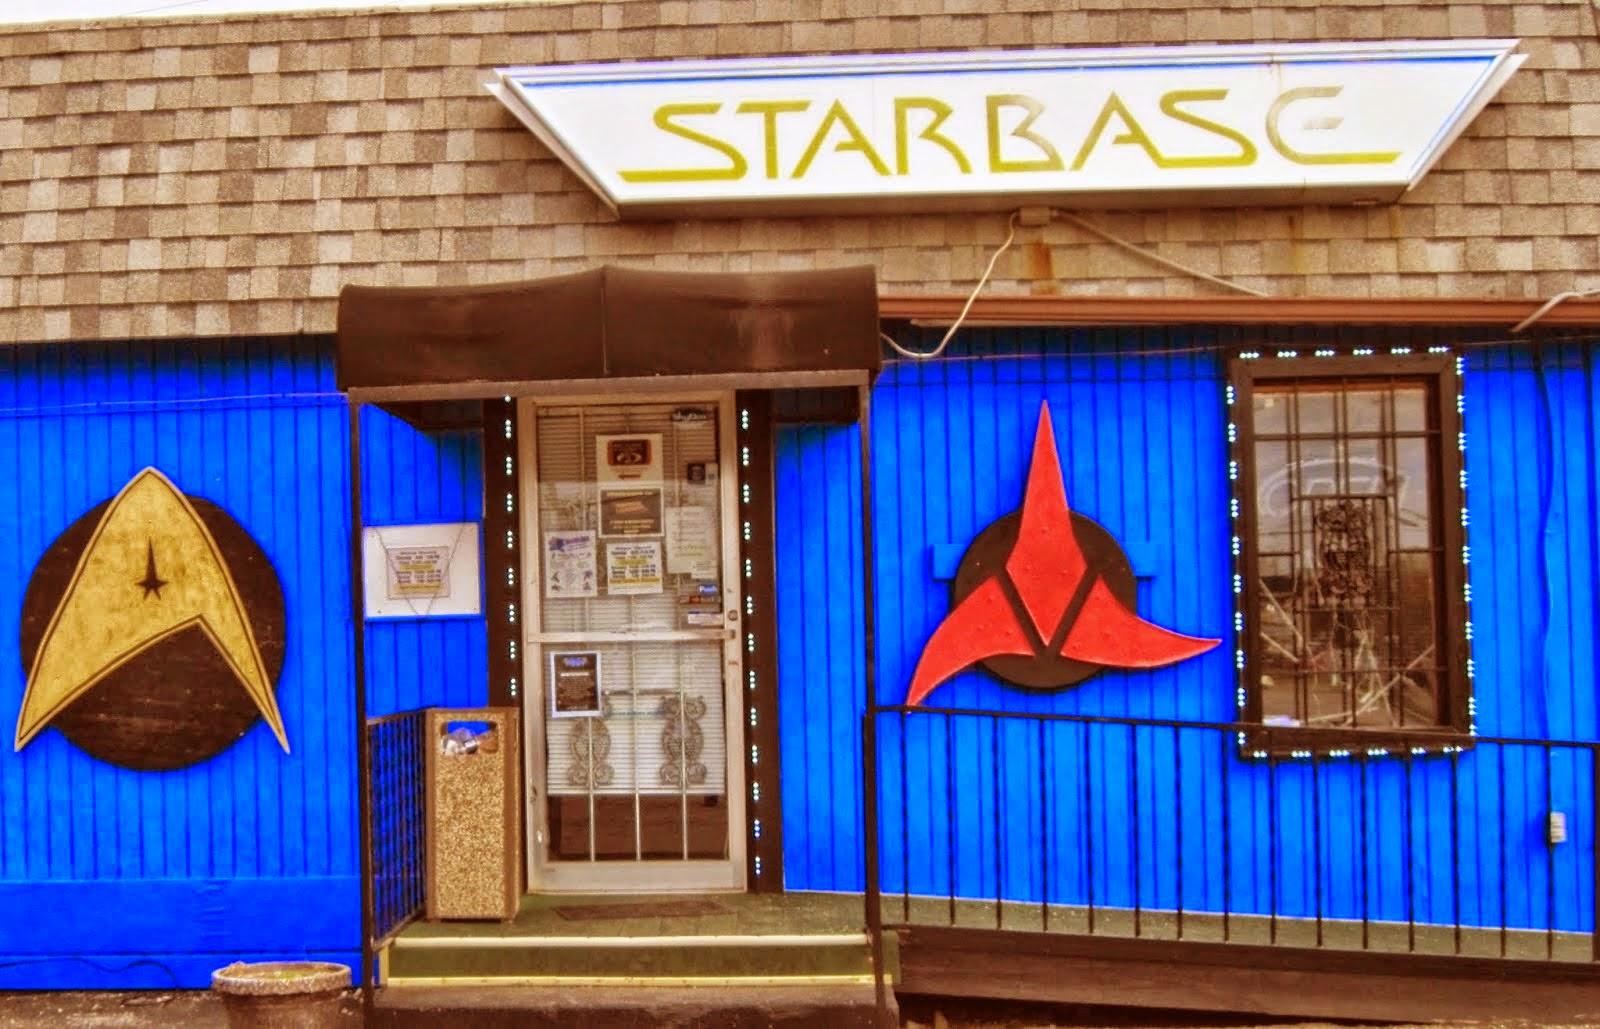 Central Ohio's Premier Science Fiction Store!